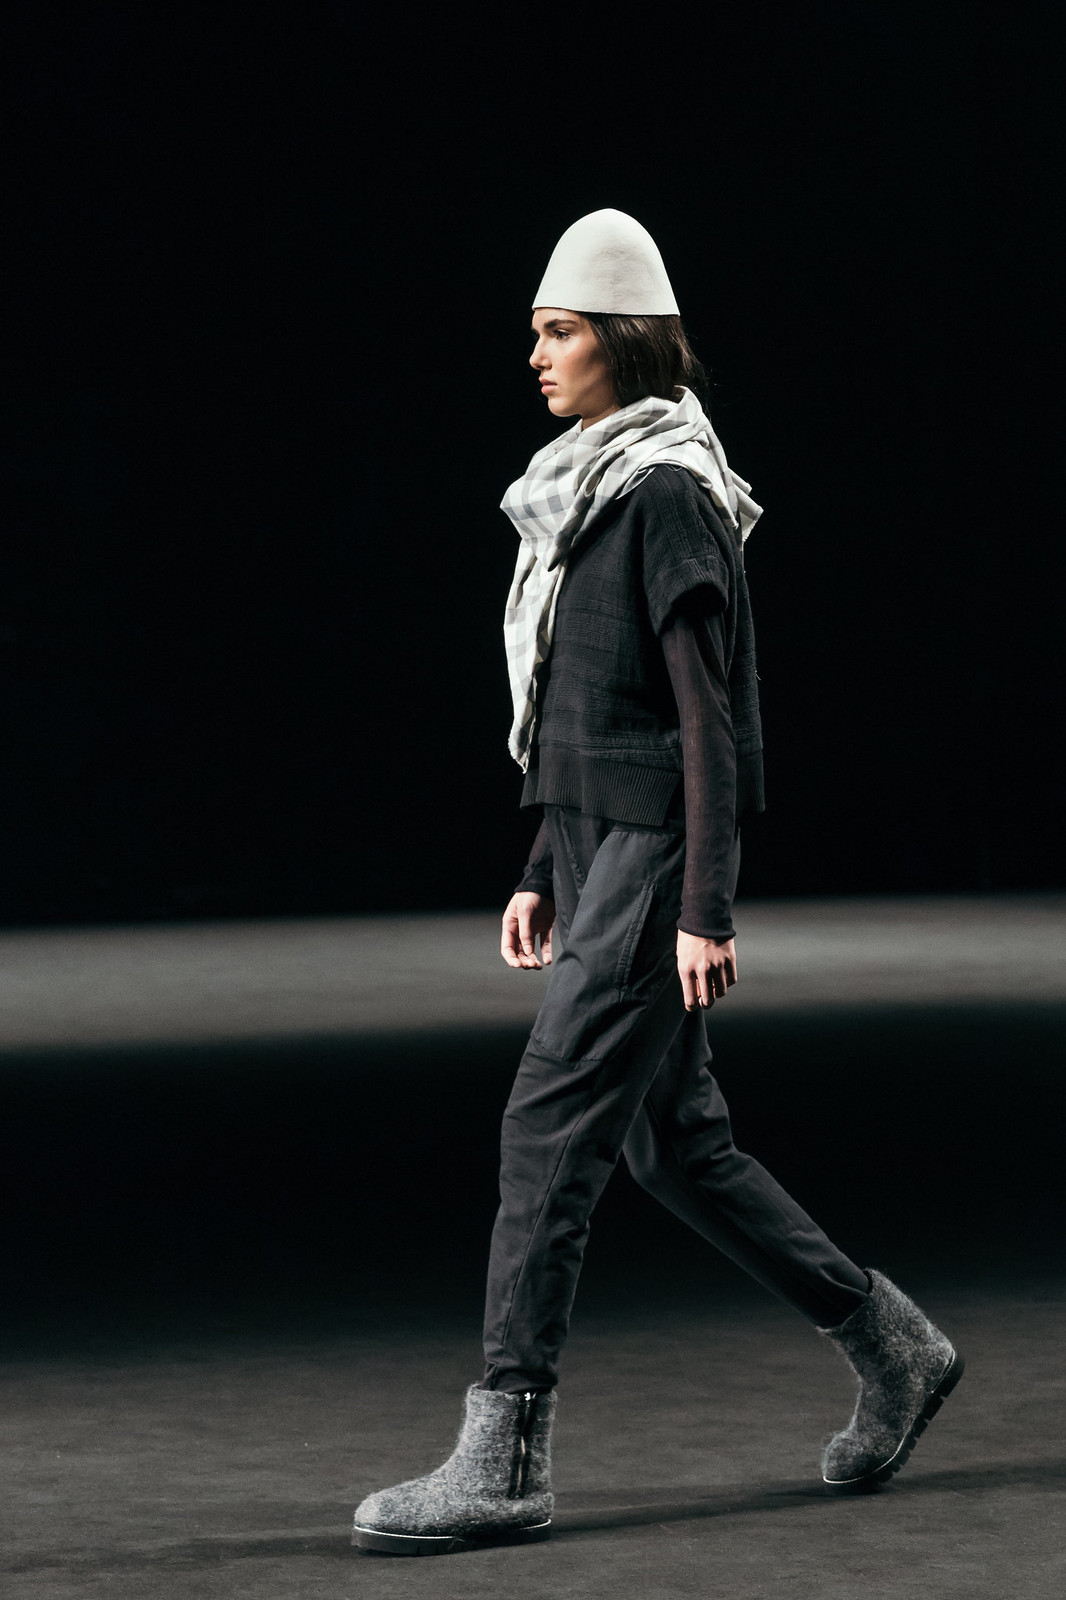 Jessie Chanes - Seams for a desire - 080 Bacelona Fashion #080bcnfasion -23